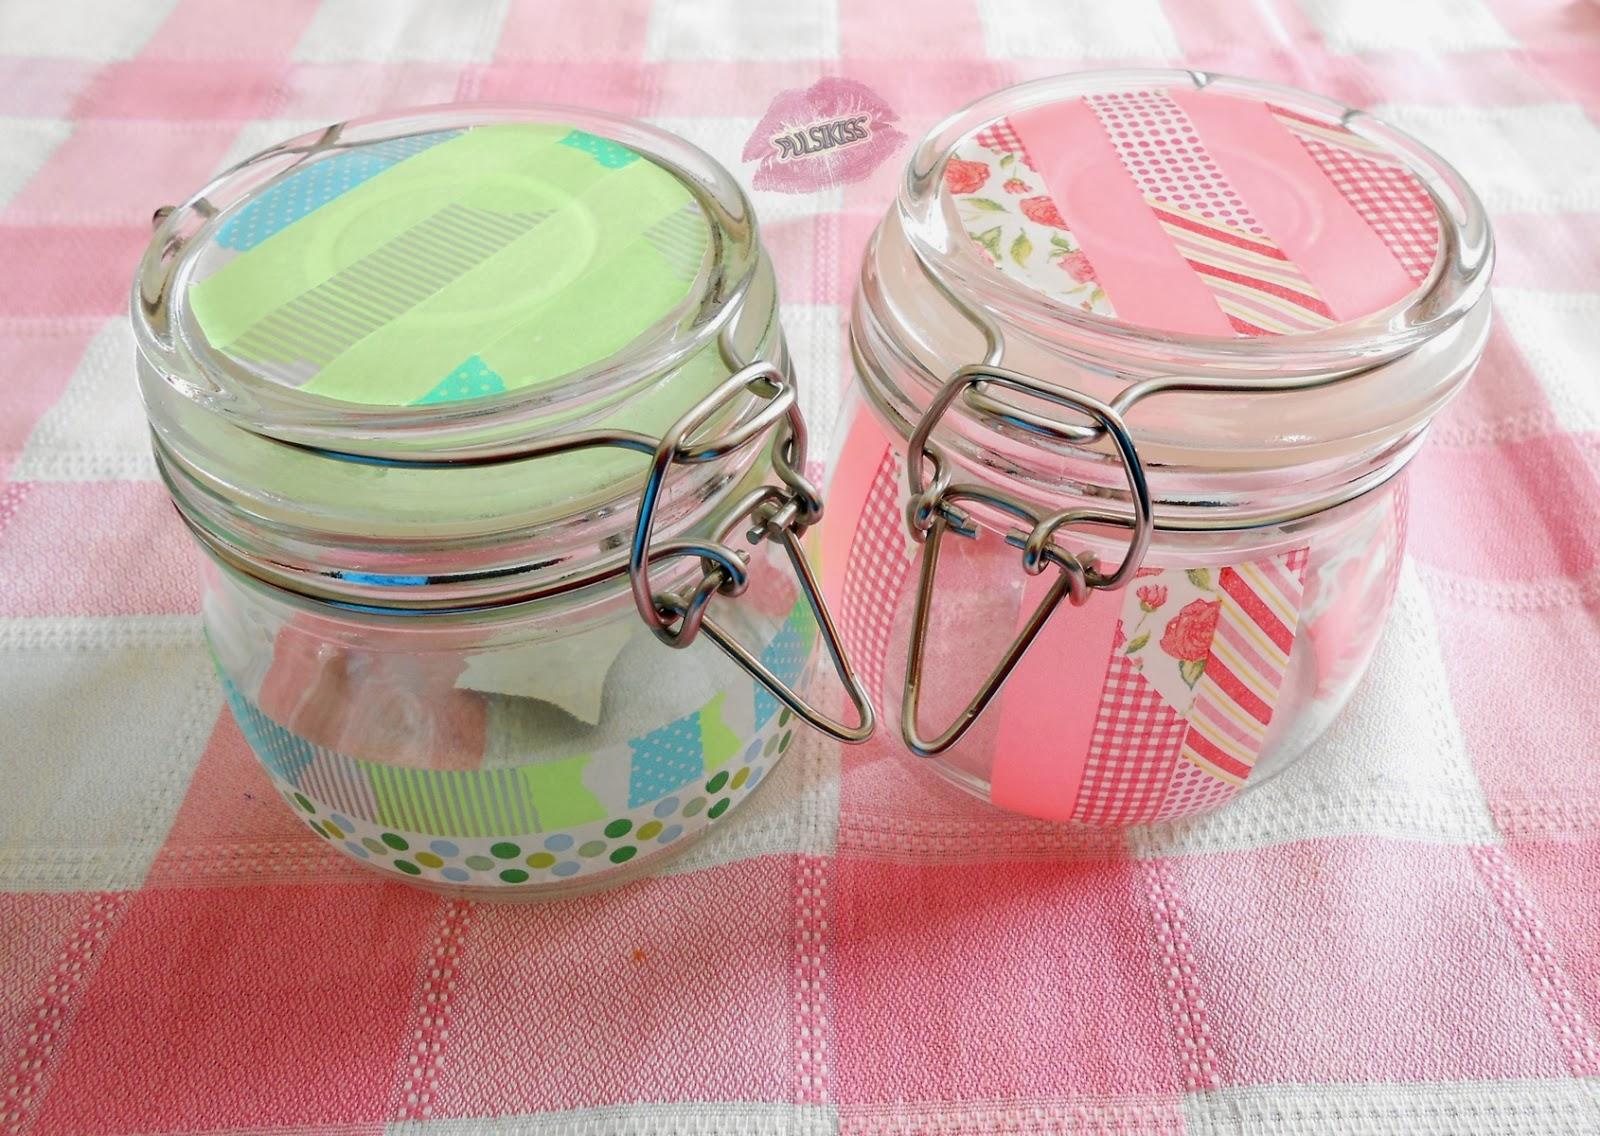 Pulsikiss decorar tarros con washi tape - Decorar con washi tape ...